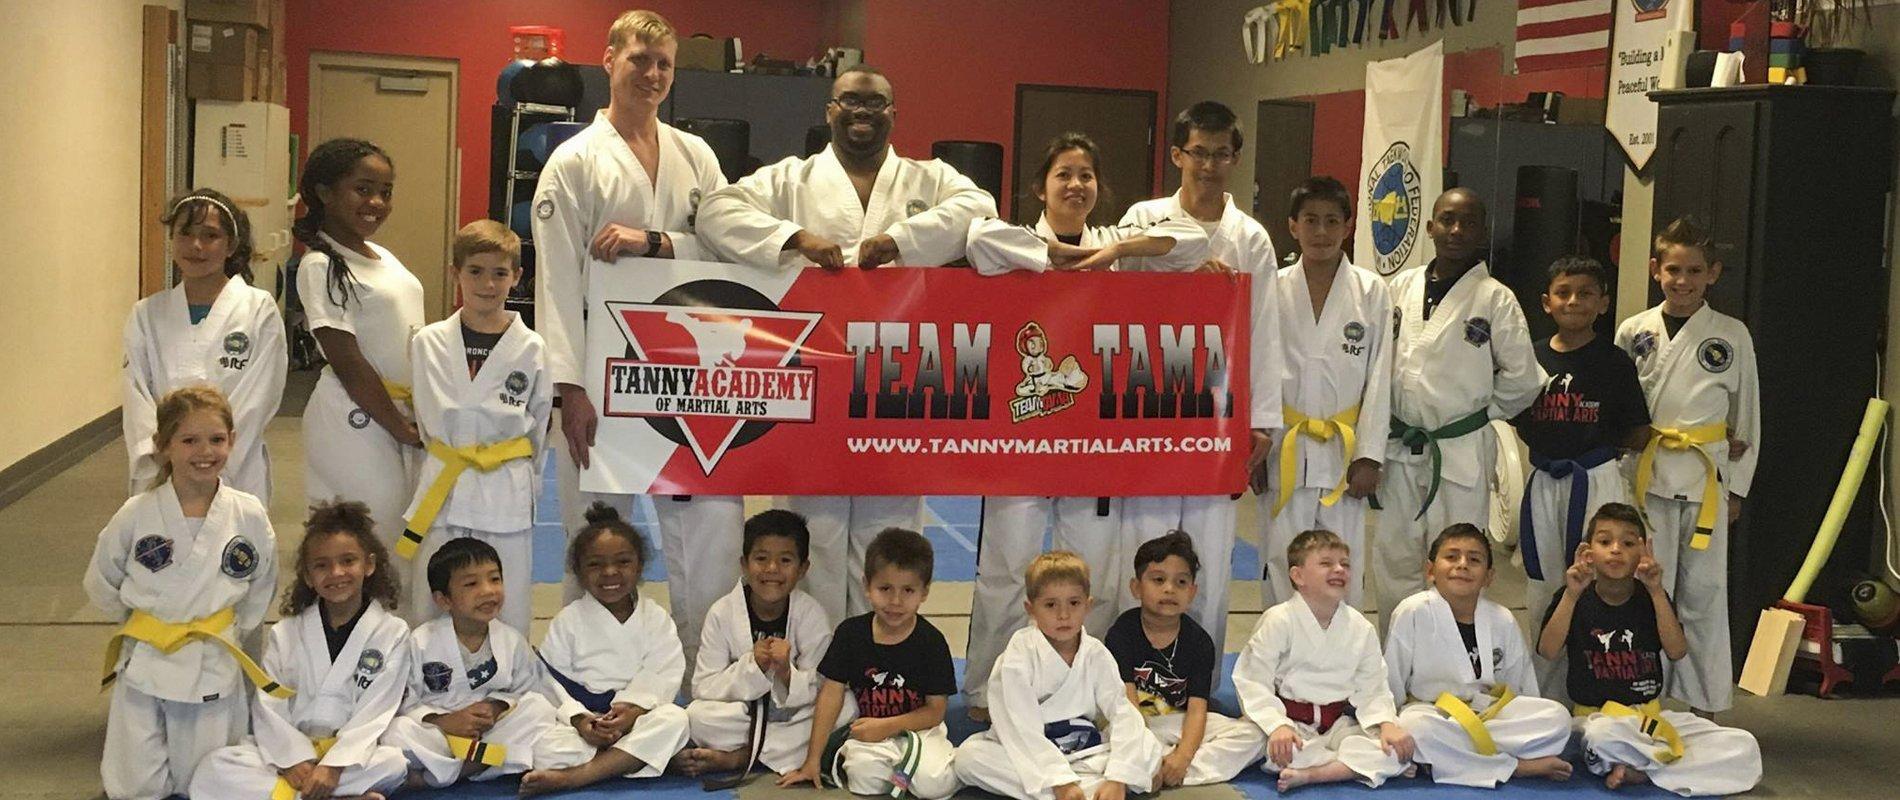 Team TAMA Group Photo